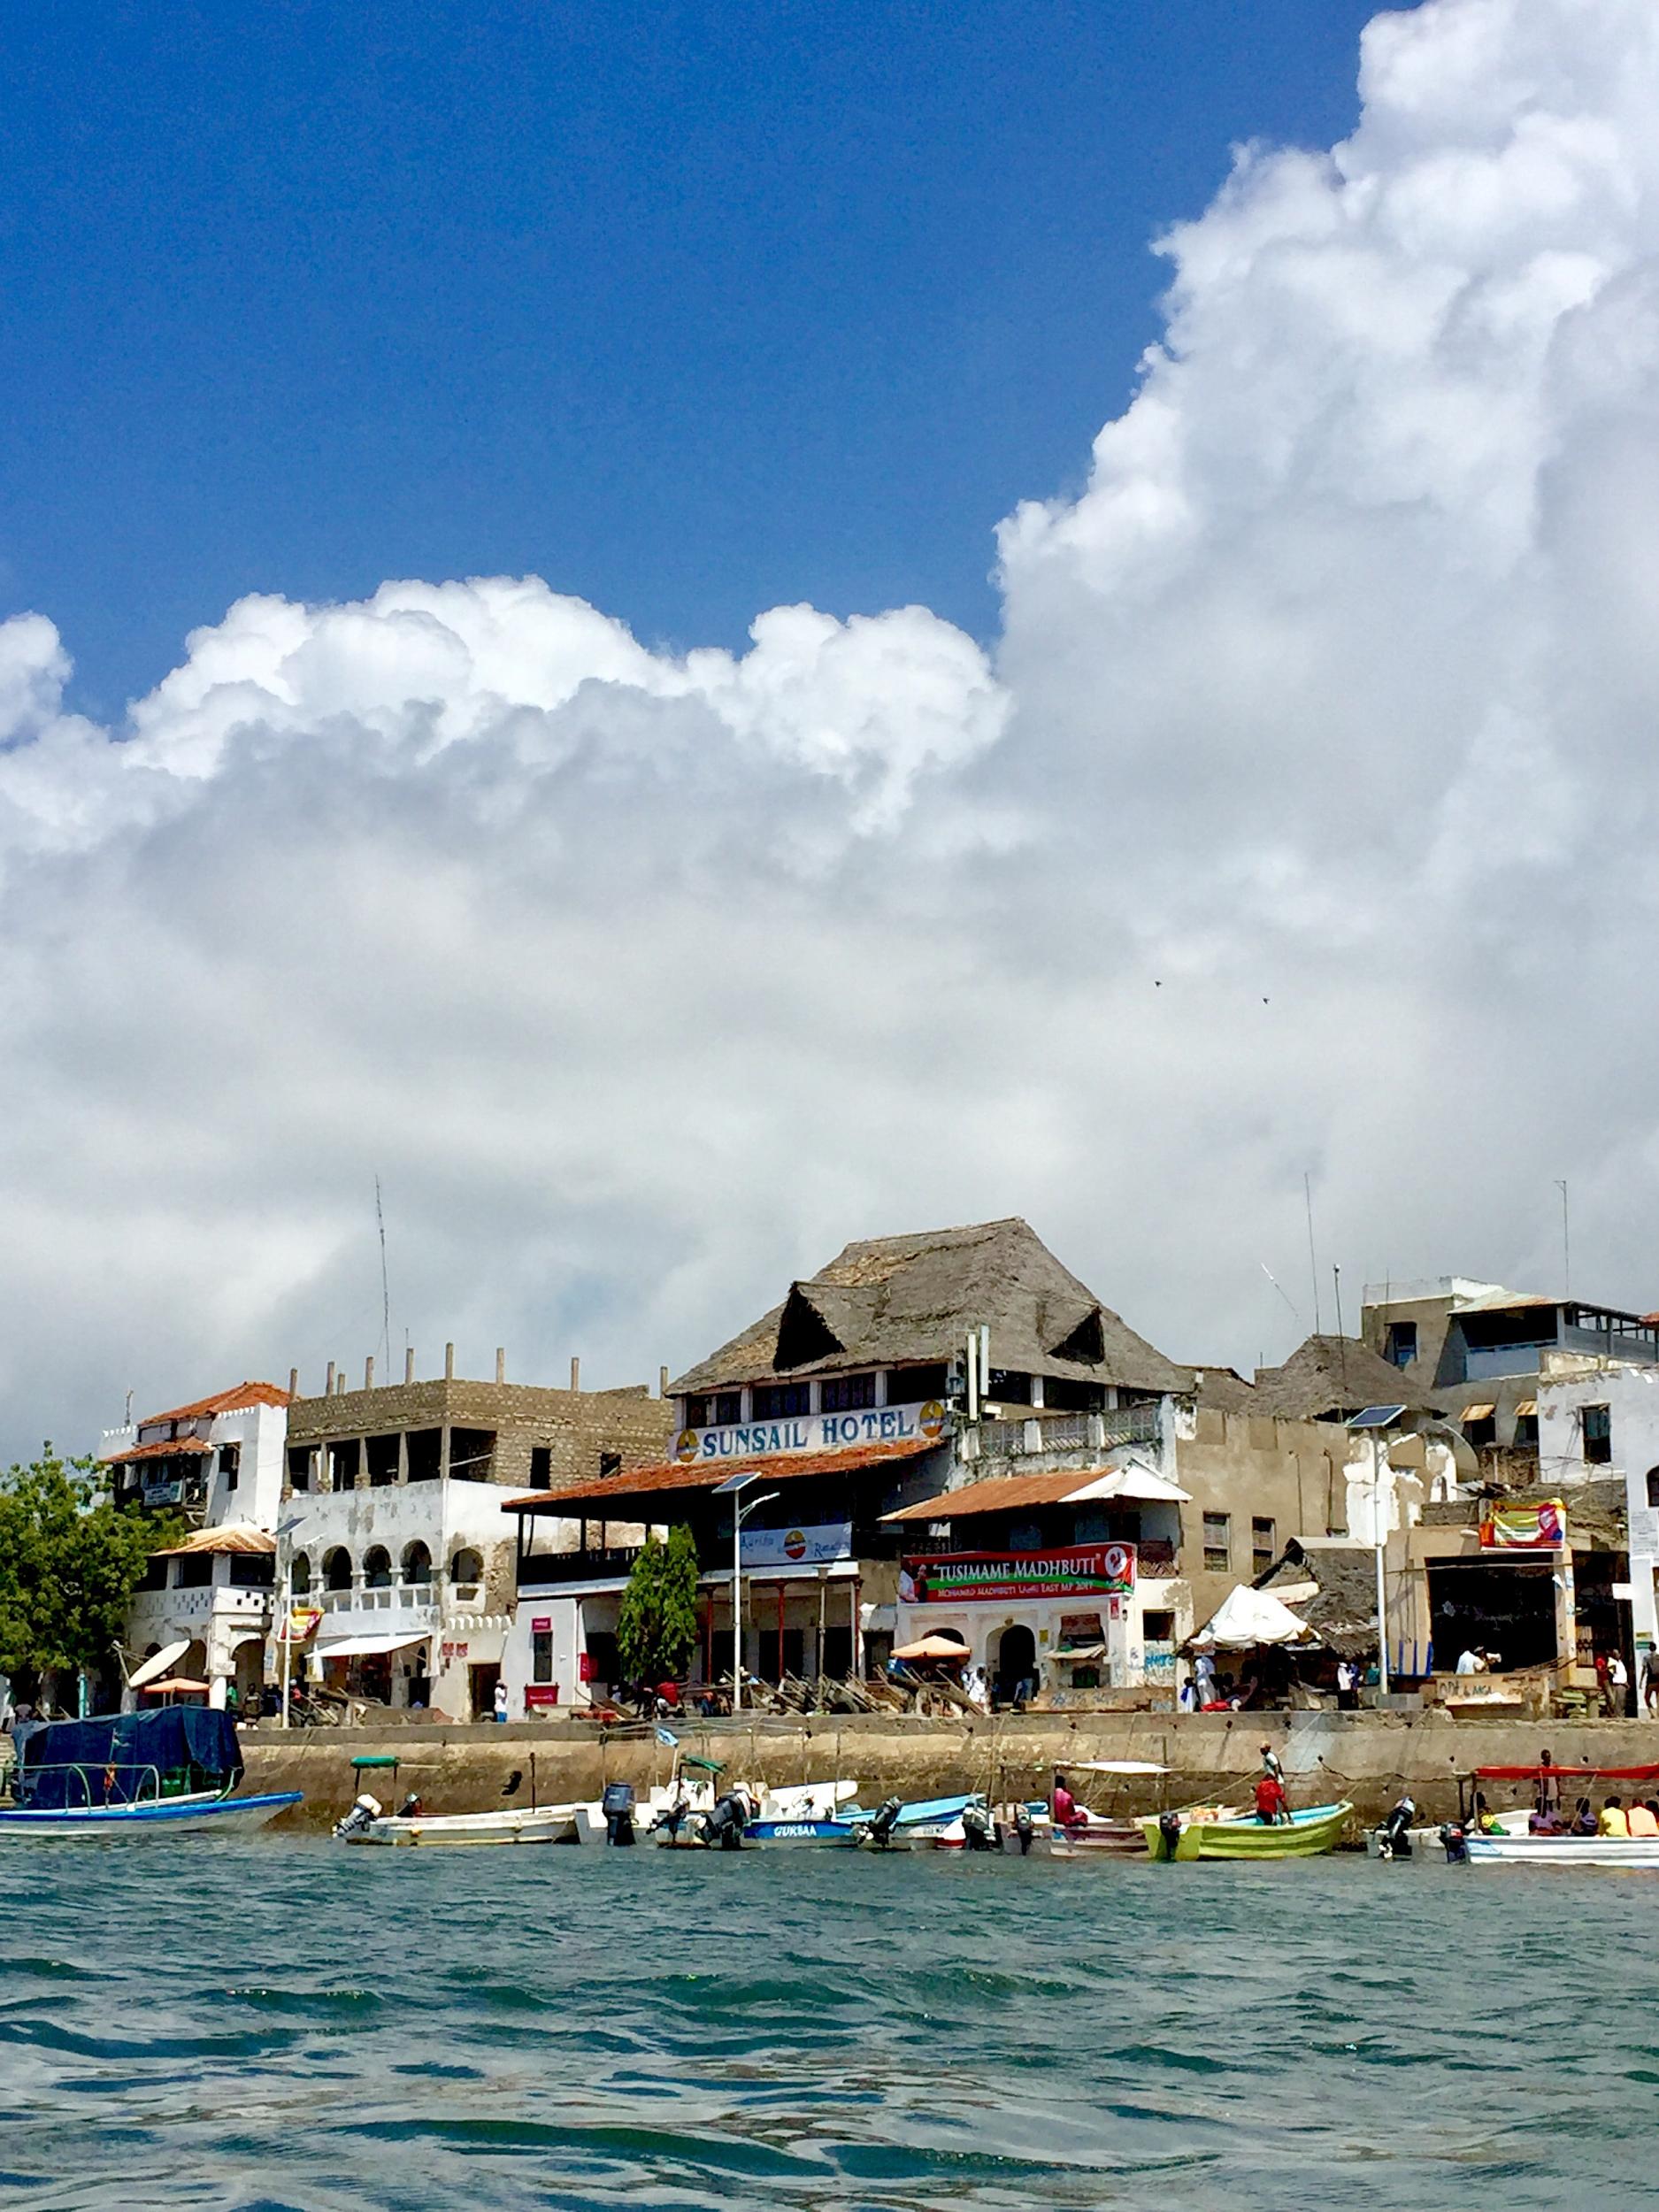 Lamu Island, the headquarters of Lamu County and site of Kenya's oldest town